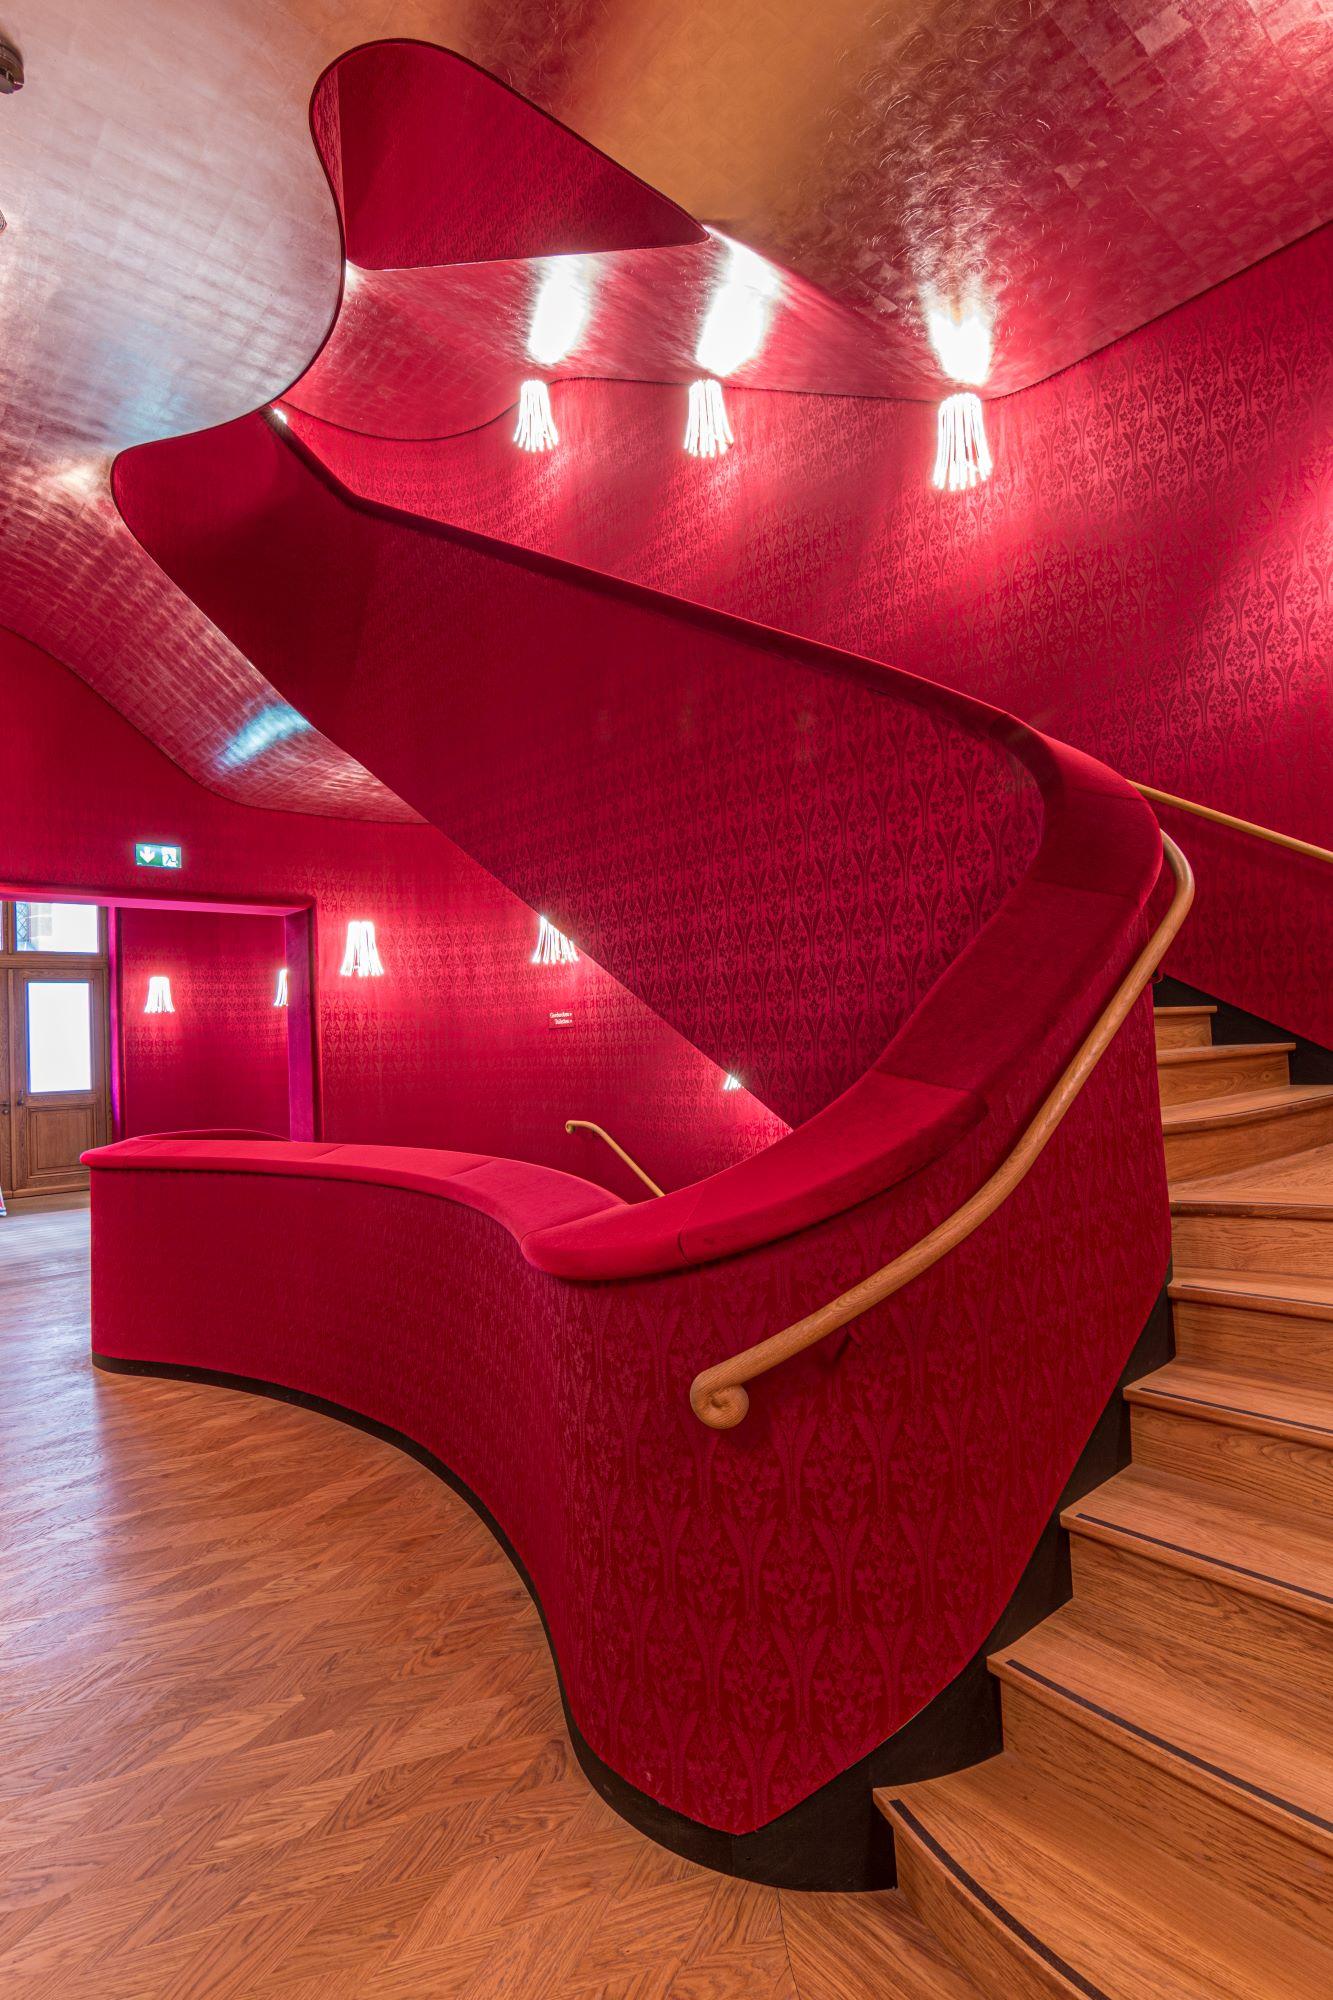 Stair Image 2309